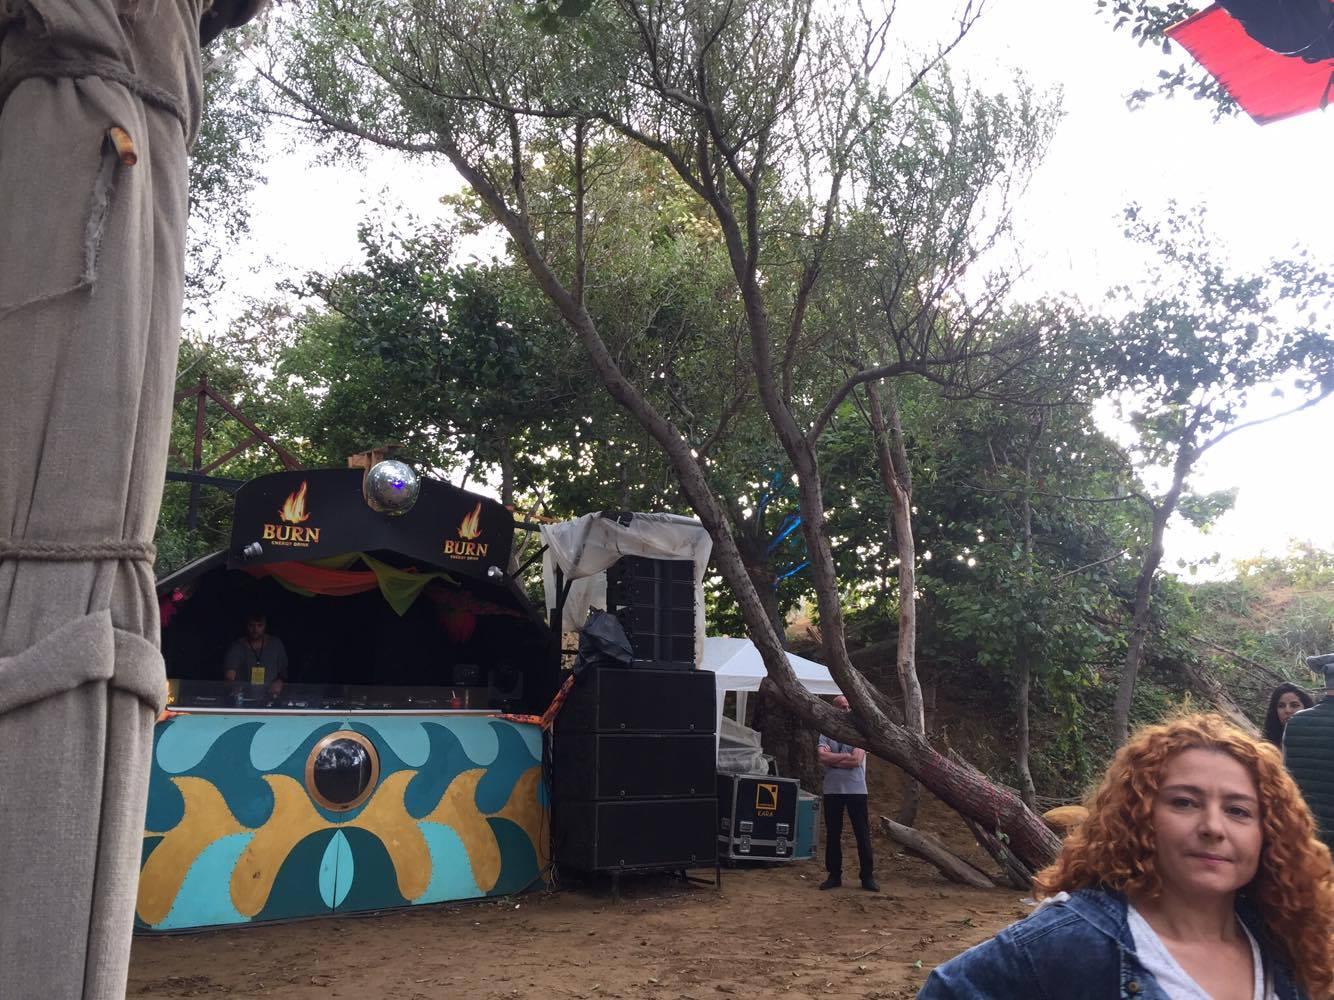 cisetta-burn-electronica-festival-ali-efe-dinc